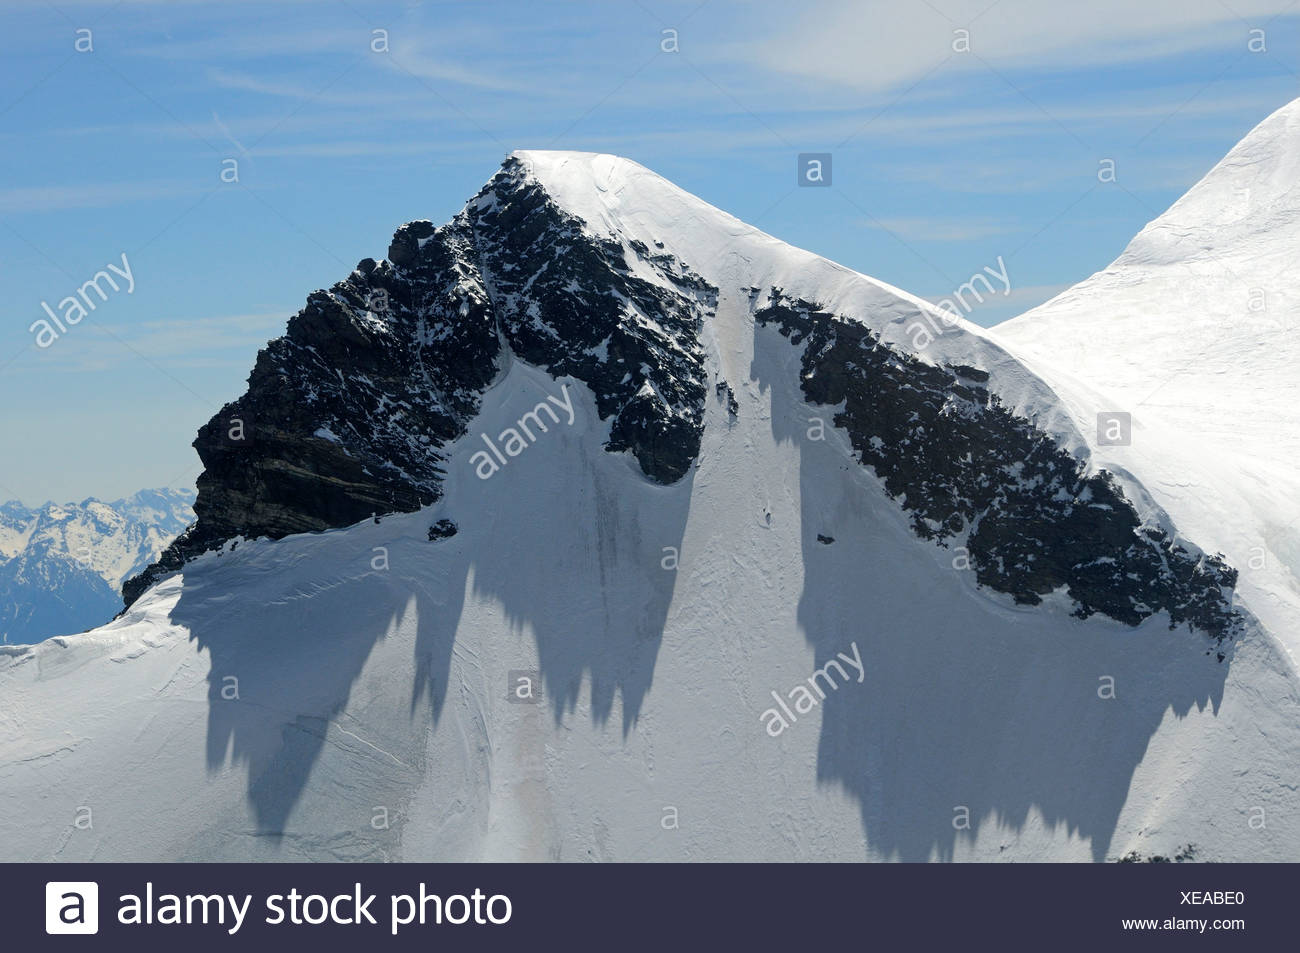 Rocky peak at the summit of the Grand Combin, Valais, Switzerland, Europe - Stock Image